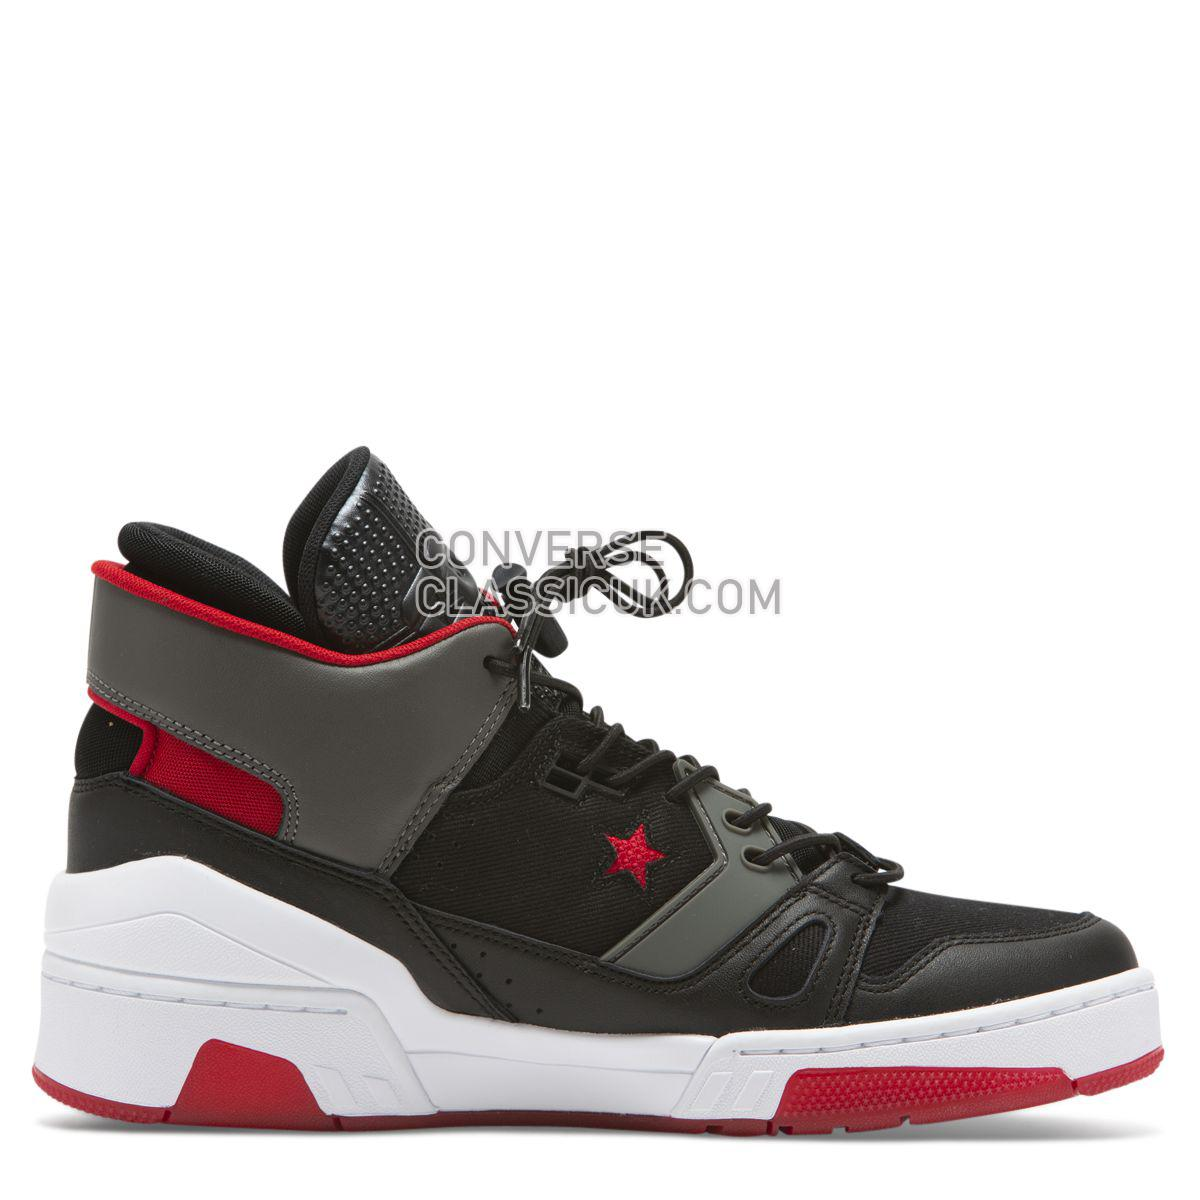 Converse ERX 260 Space Racer Mid Black Mens 165079 Black/Enamel Red/Carbon Grey Shoes